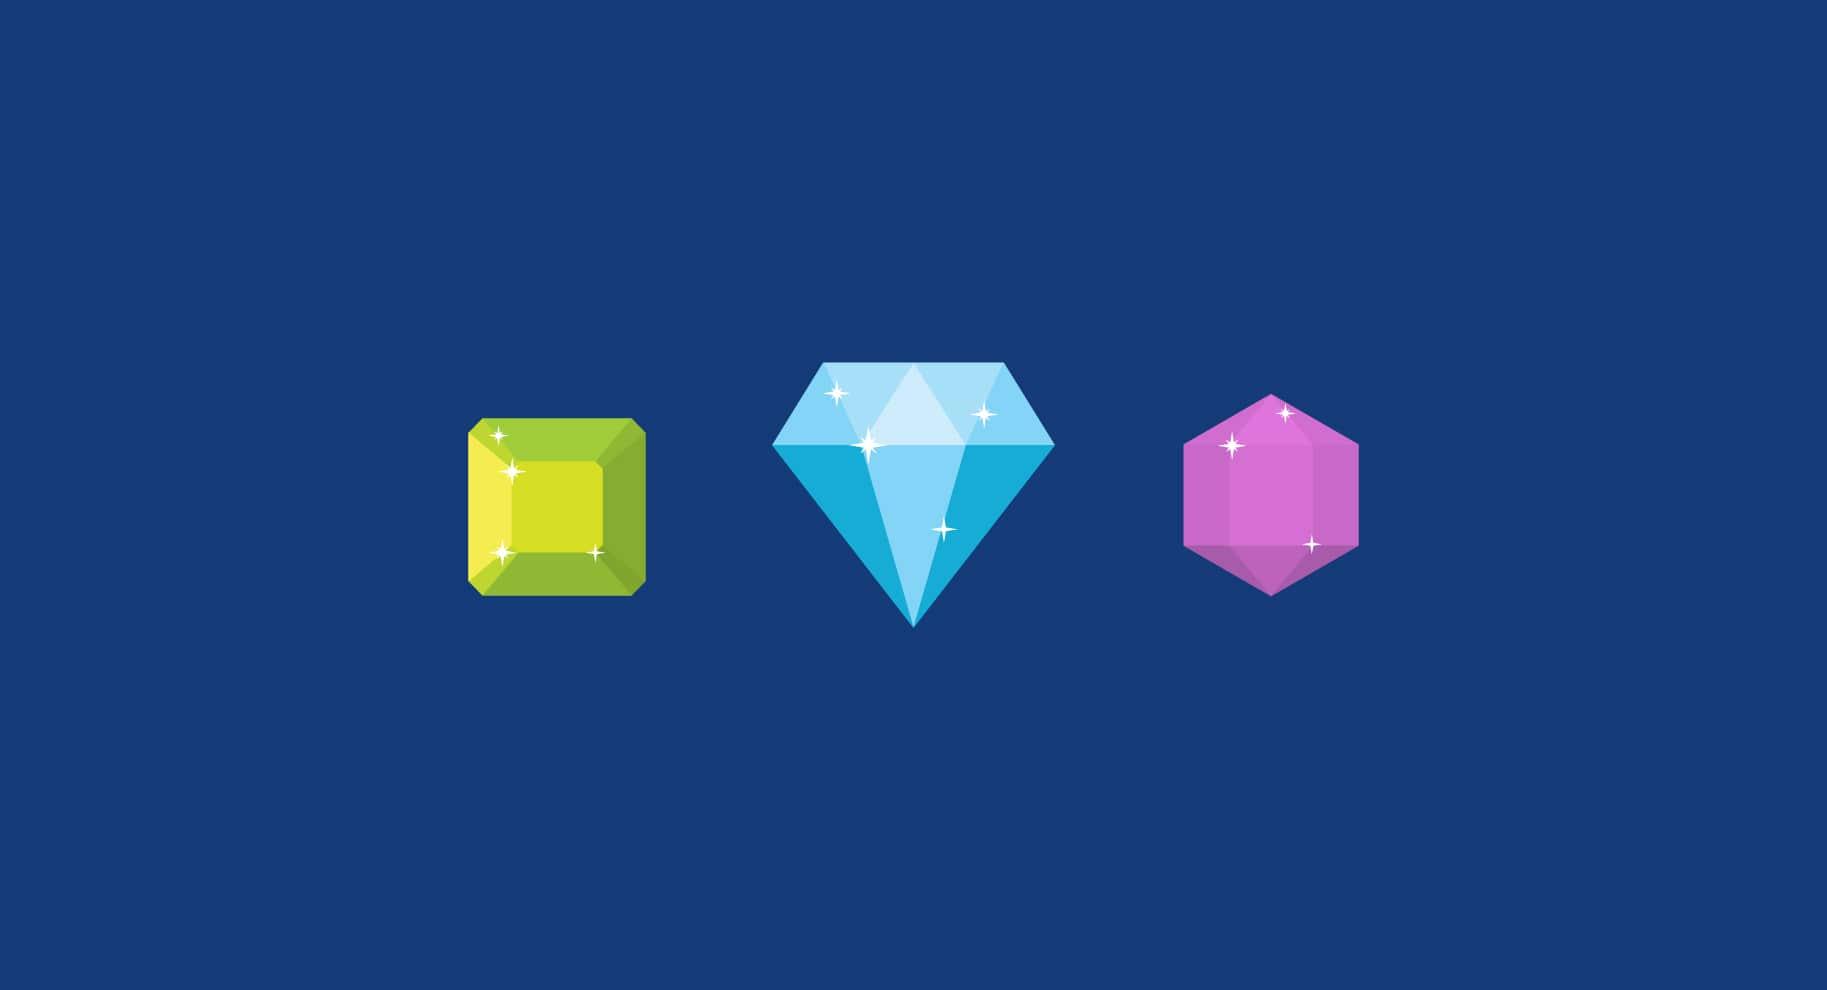 diamond alternatives illustration